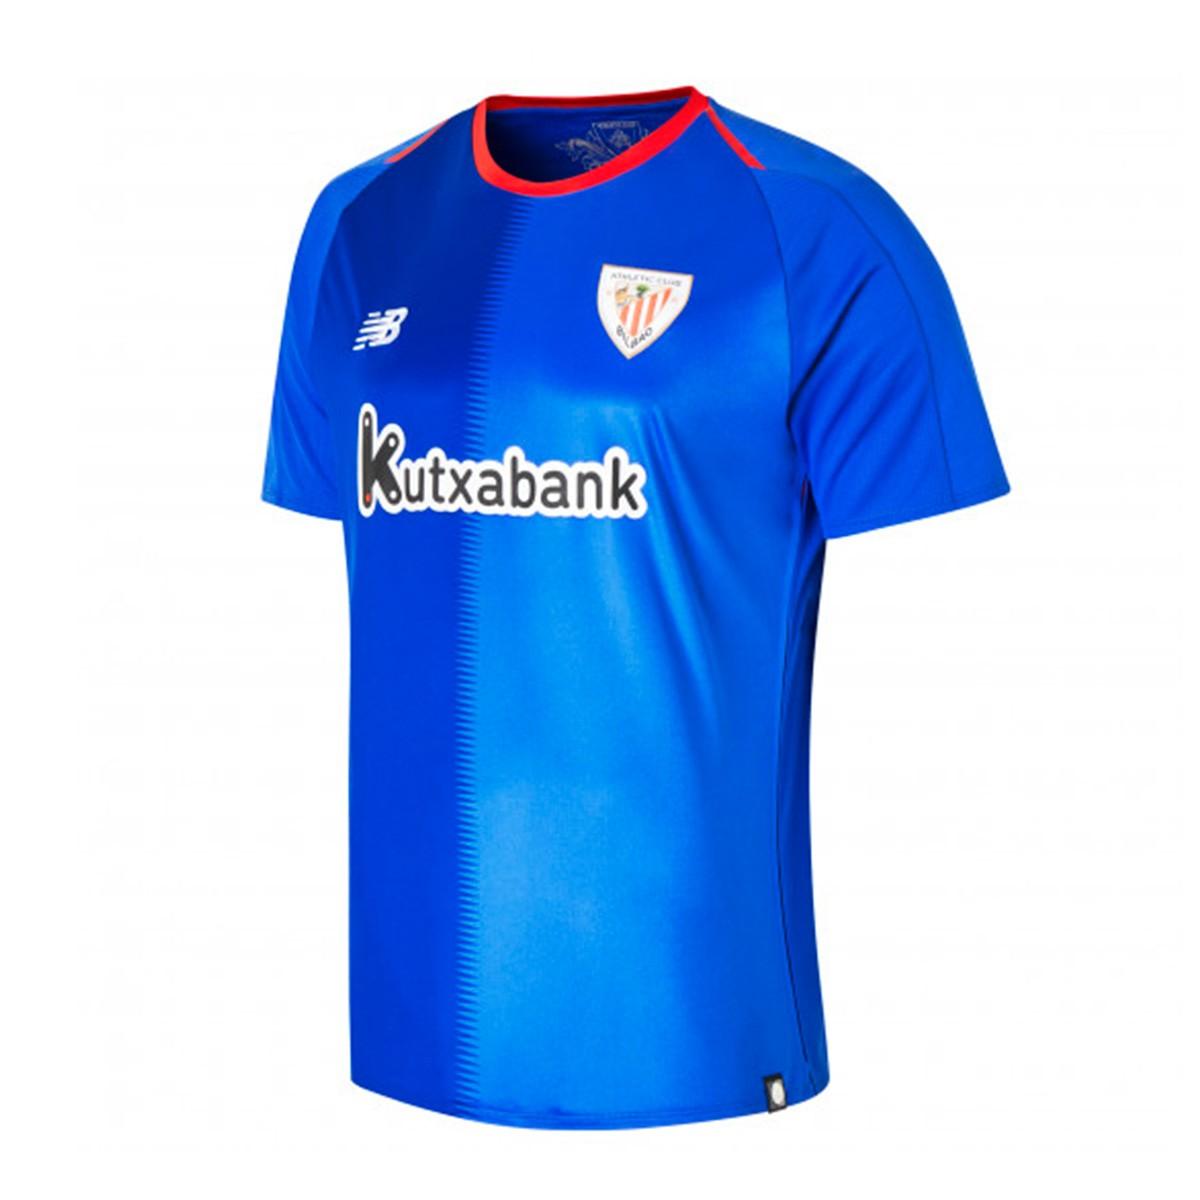 be9bf5cfda252 Camiseta New Balance AC Bilbao Segunda Equipación 2018-2019 Azul - Tienda  de fútbol Fútbol Emotion